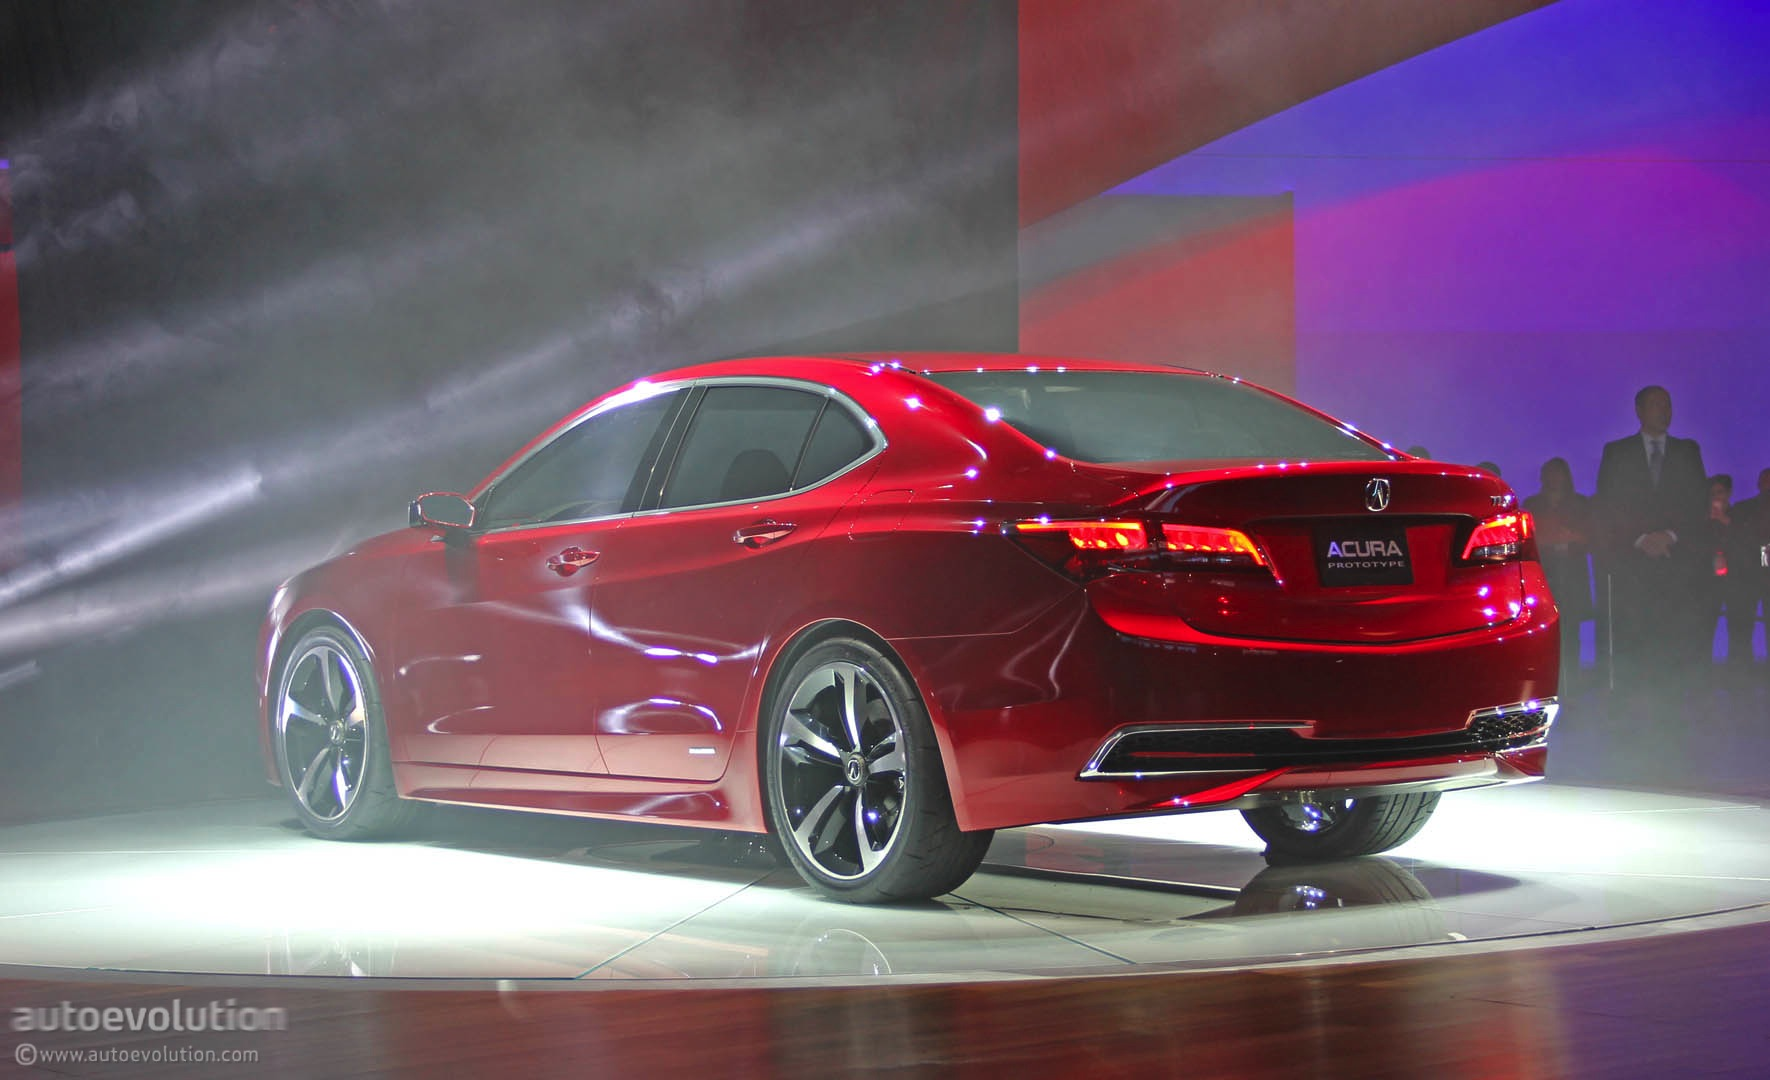 2015 Acura TLX Prototype at 2014 Detroit Auto Show